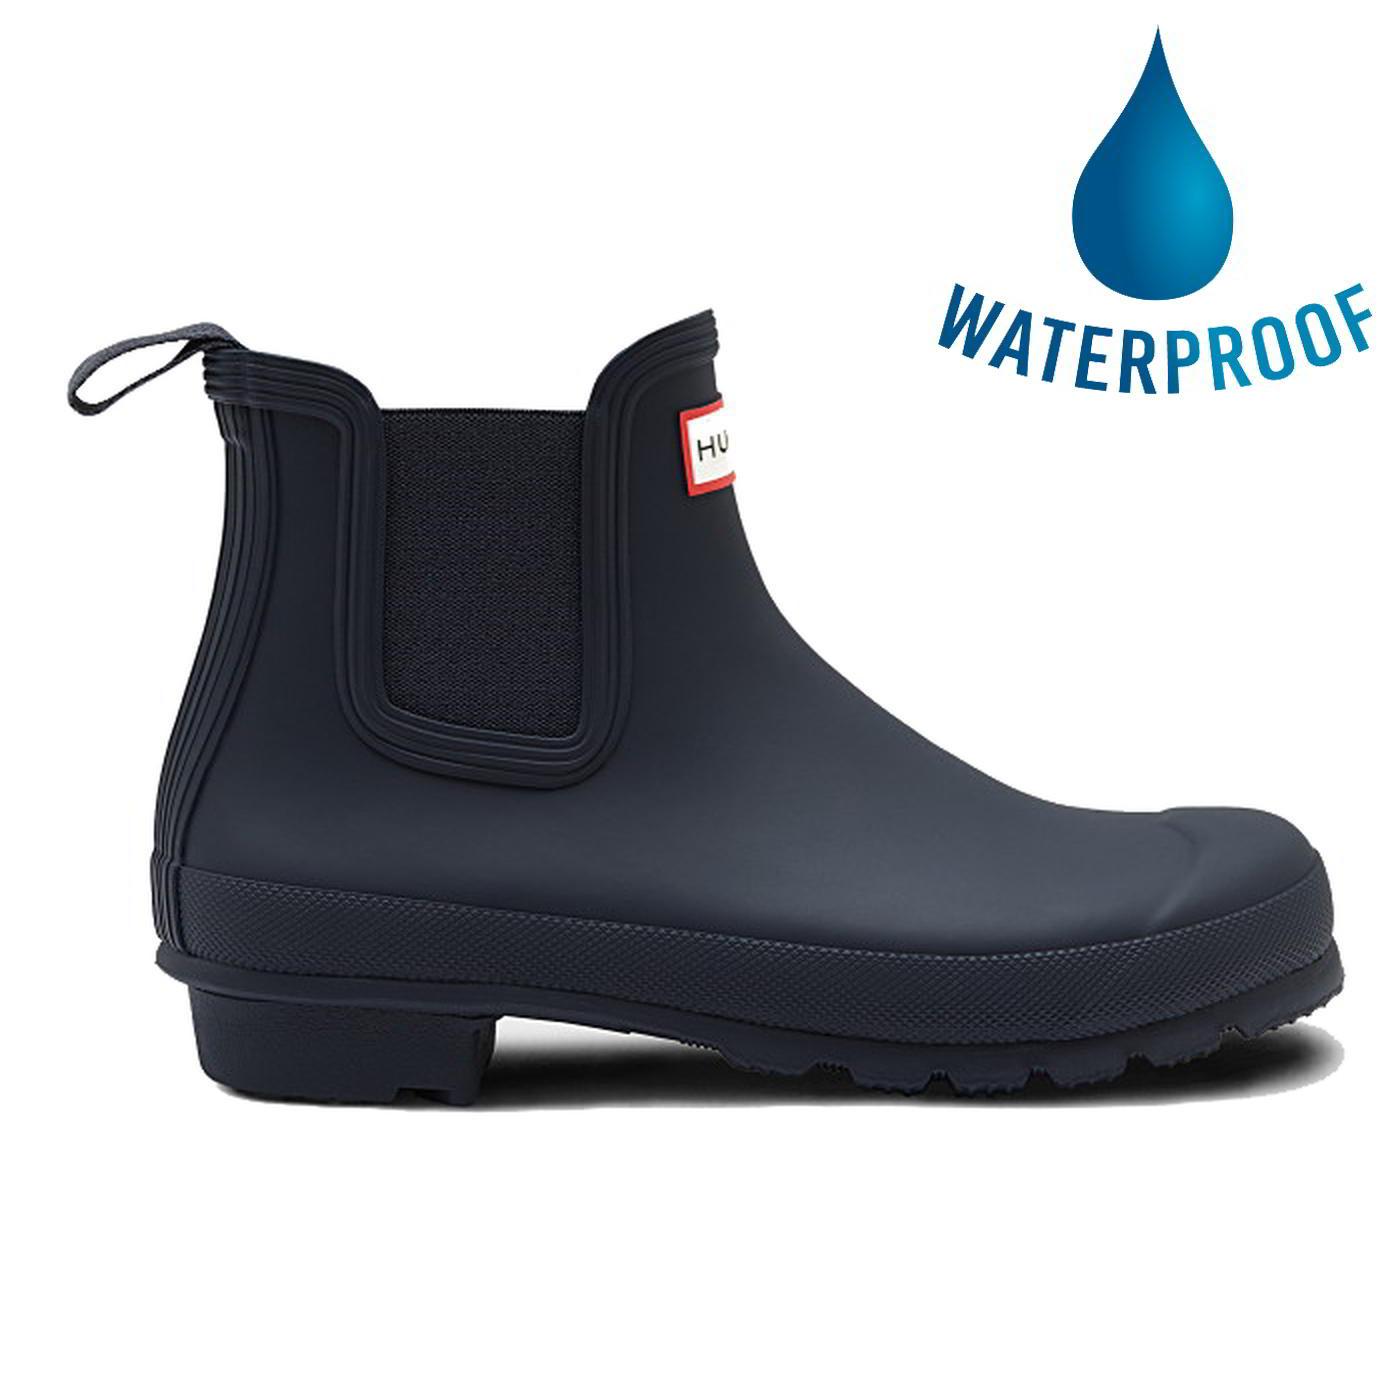 Hunter Womens Original Chelsea Short Wellies Rain Boots - Navy